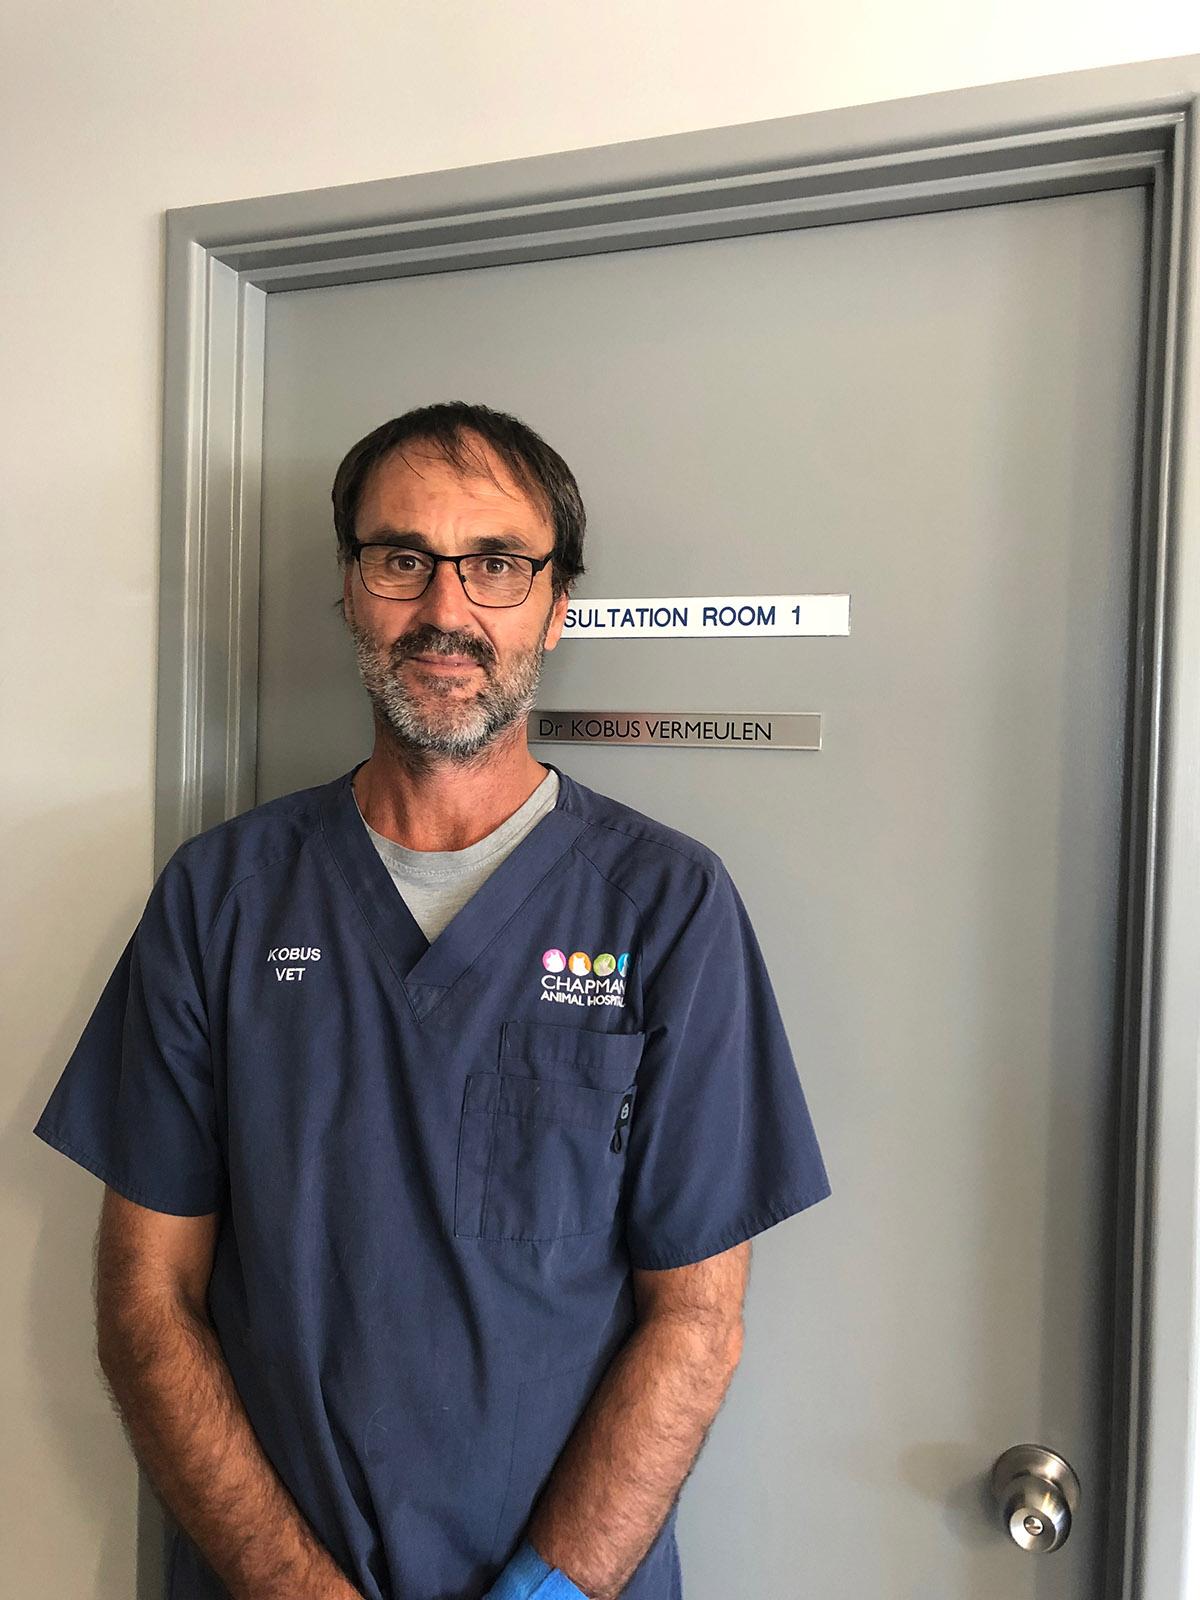 Dr. Kobus Vermeulen